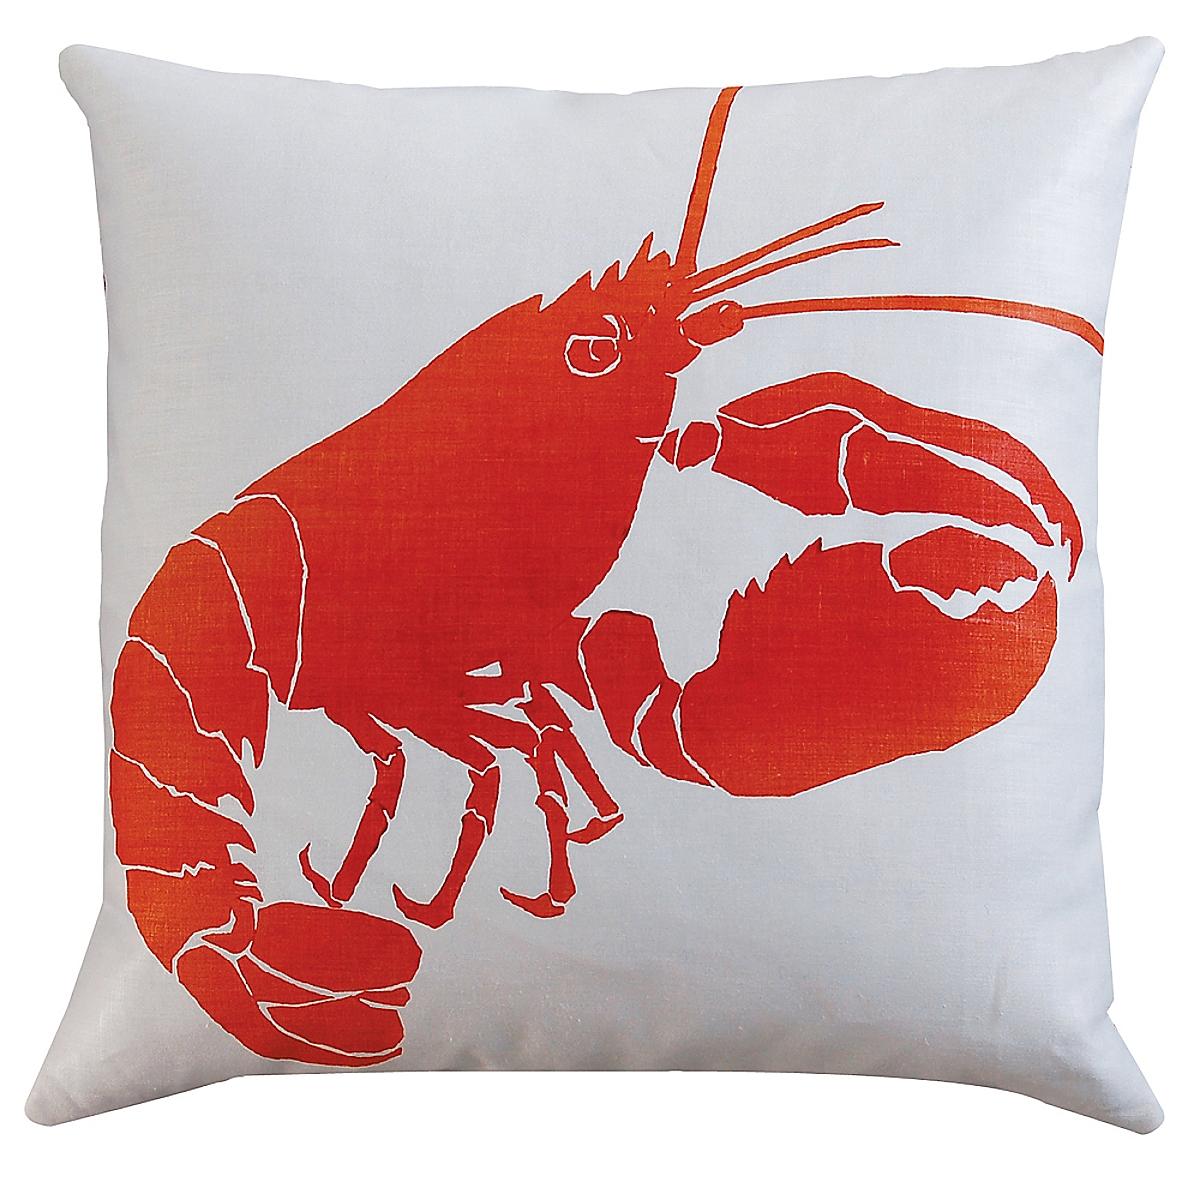 "20"" x 20"" - Lobster Pillow: Rhubarb on White Linen"